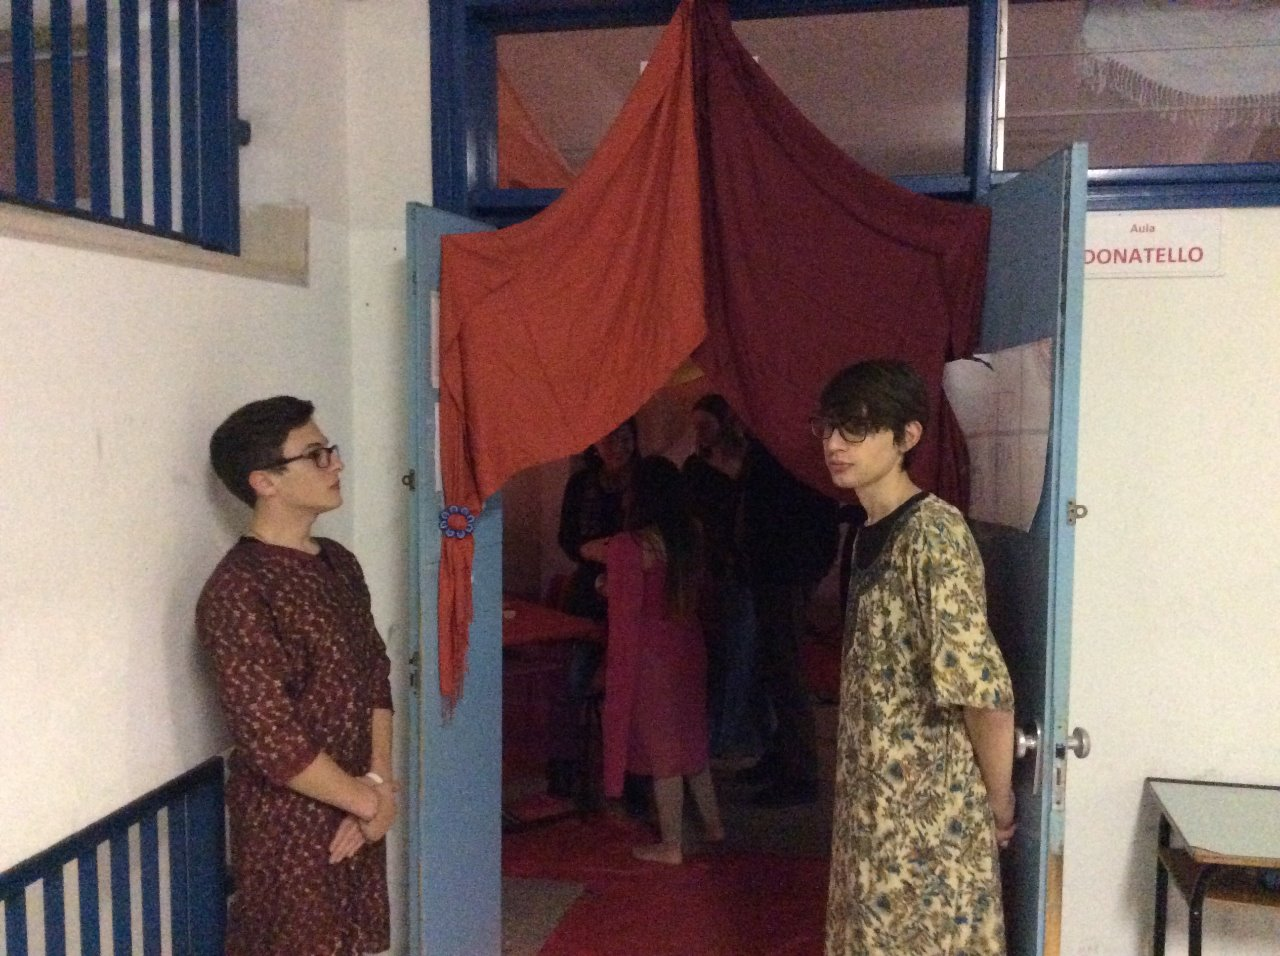 Crowdfunding De Sanctis 2015 (52)